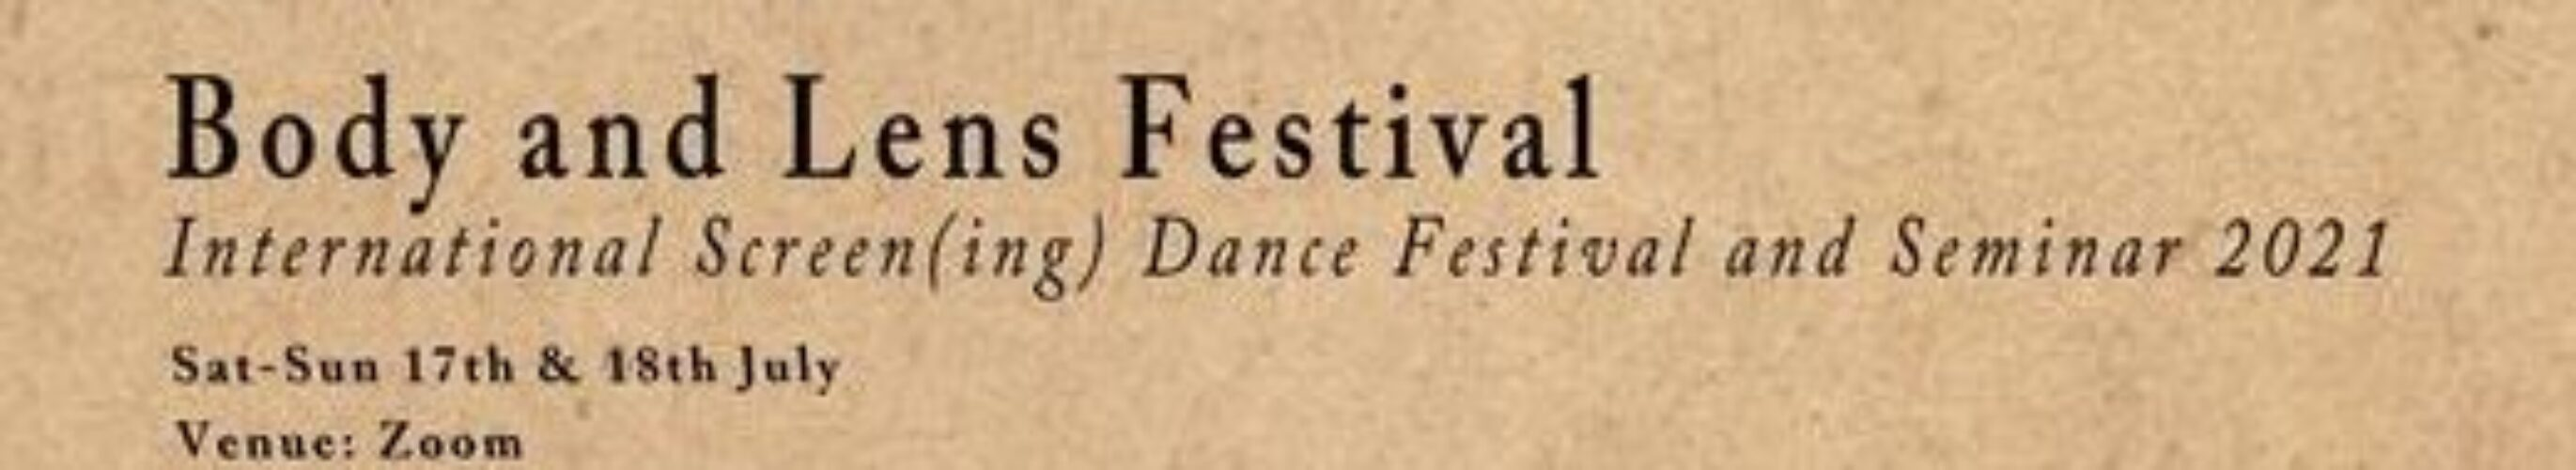 Body and Lens Festival 2021